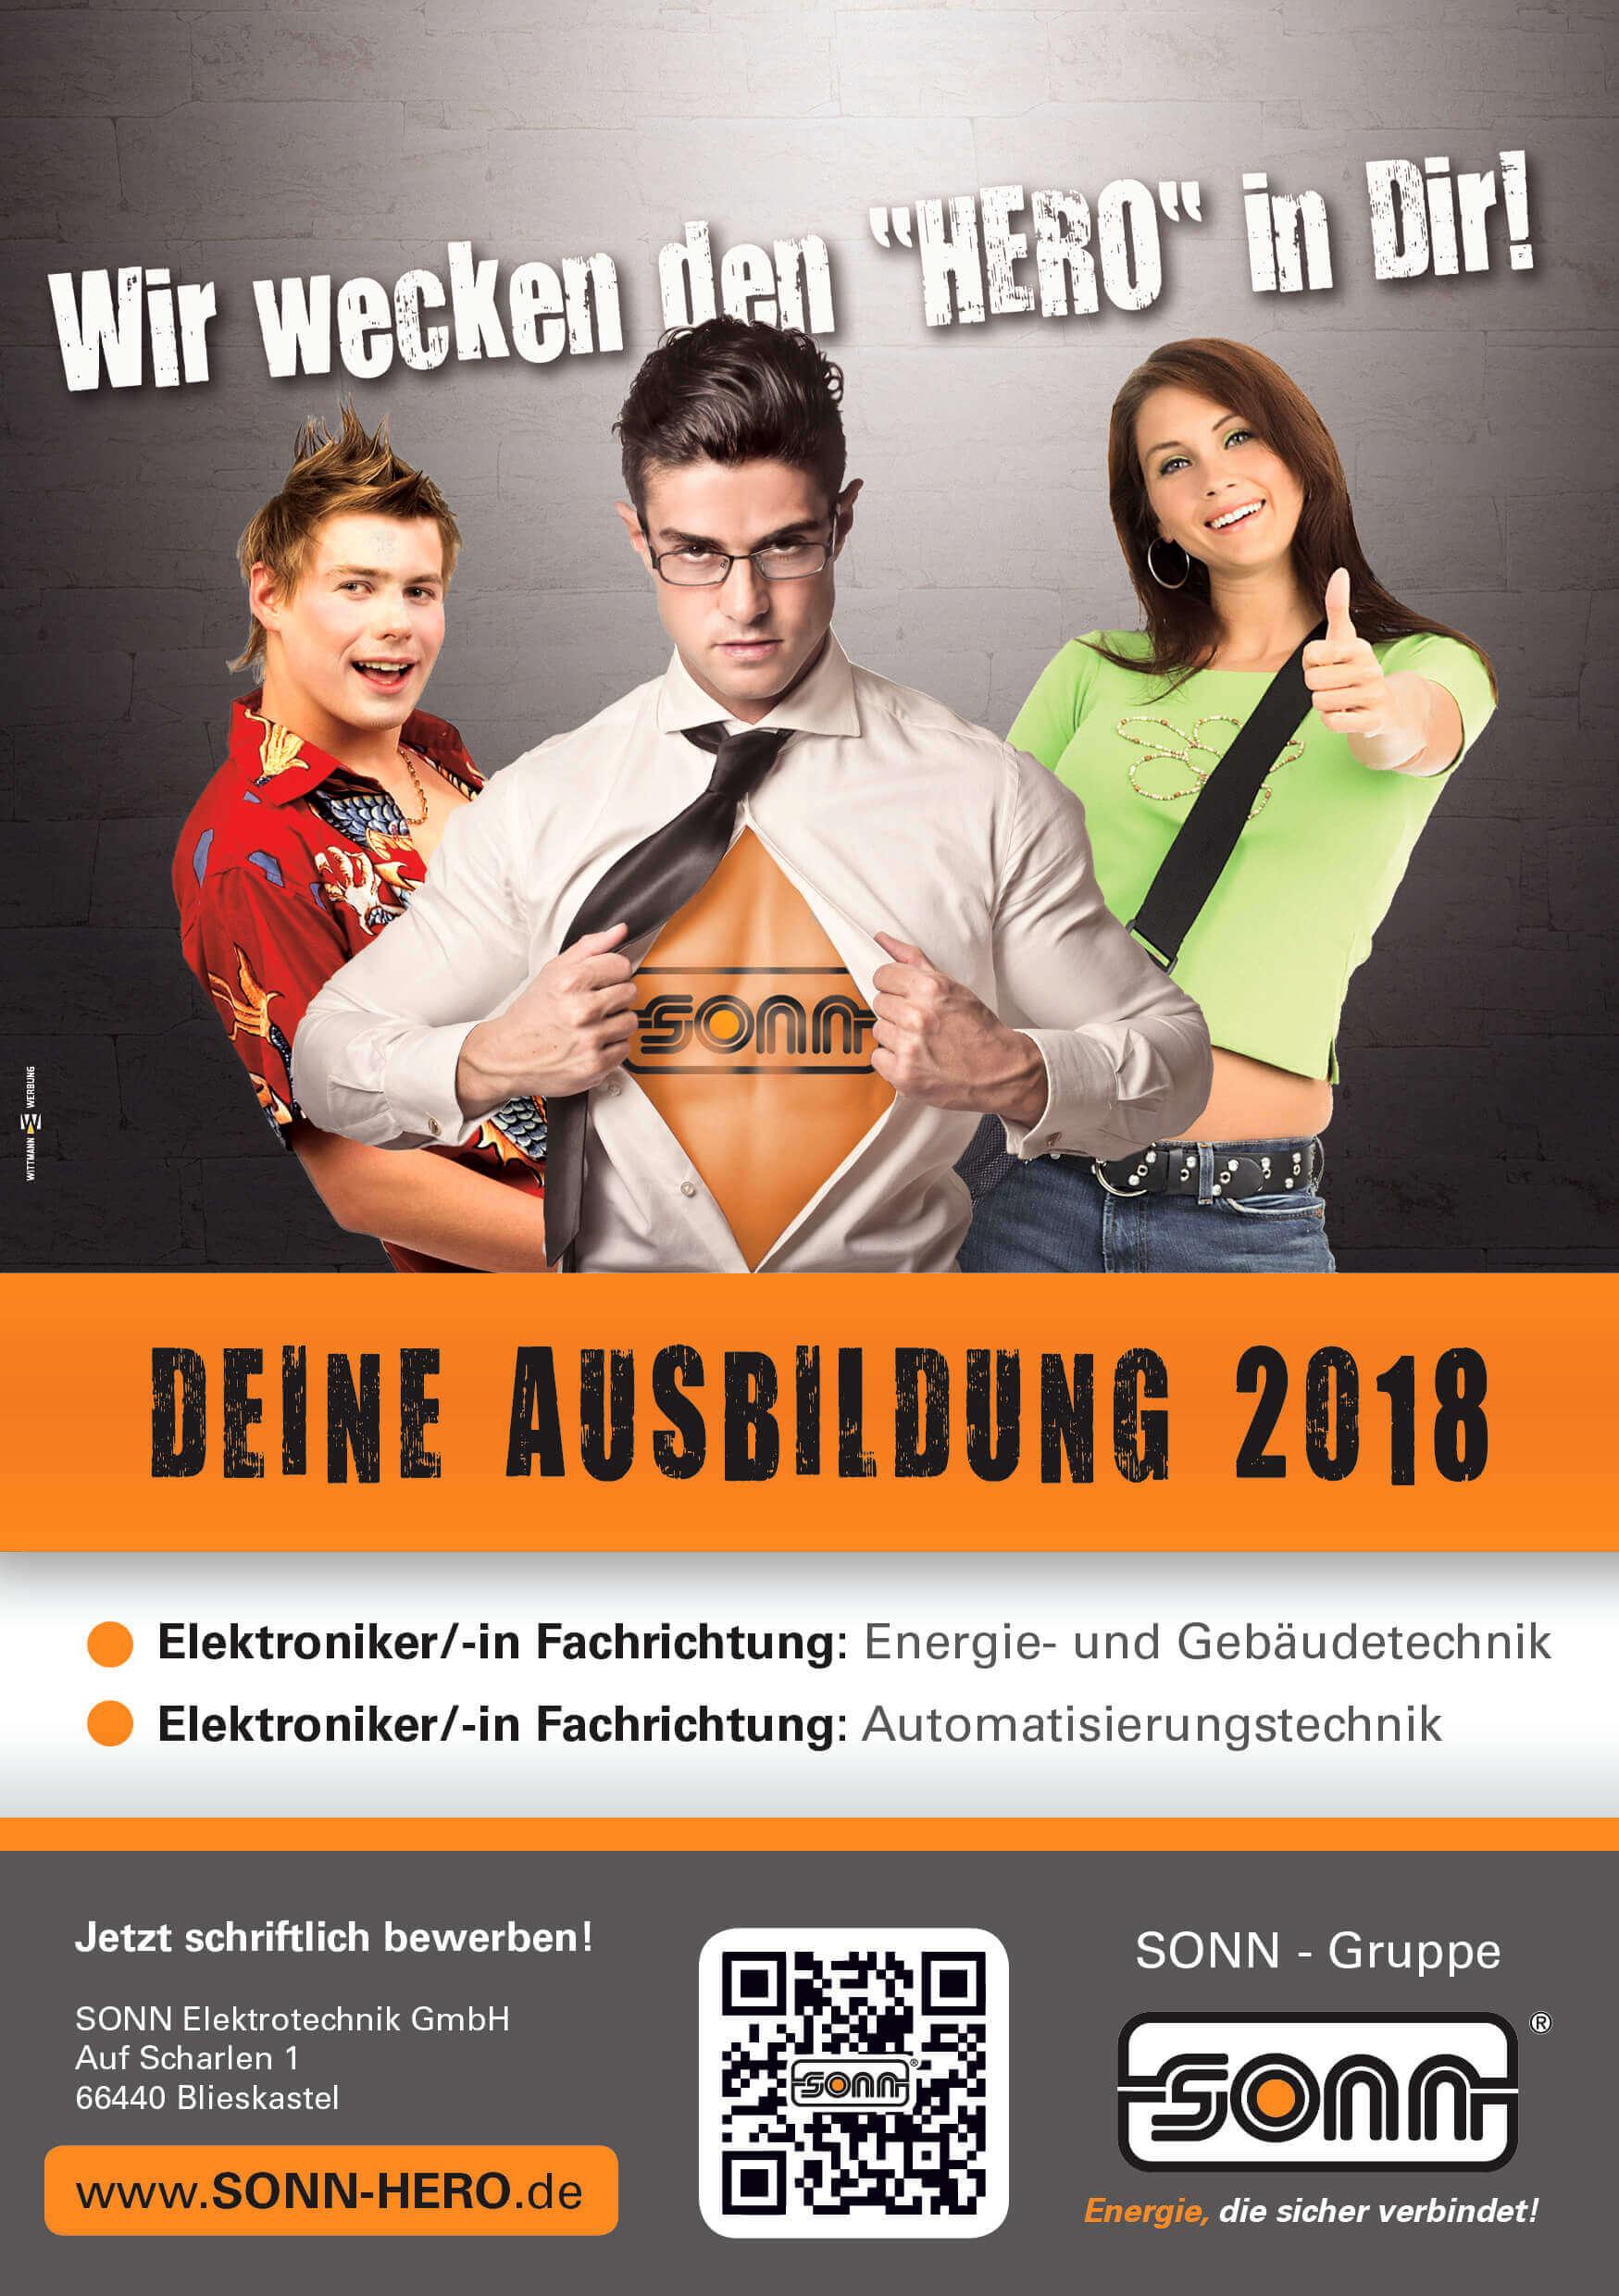 Ausbildung Sonn 2018